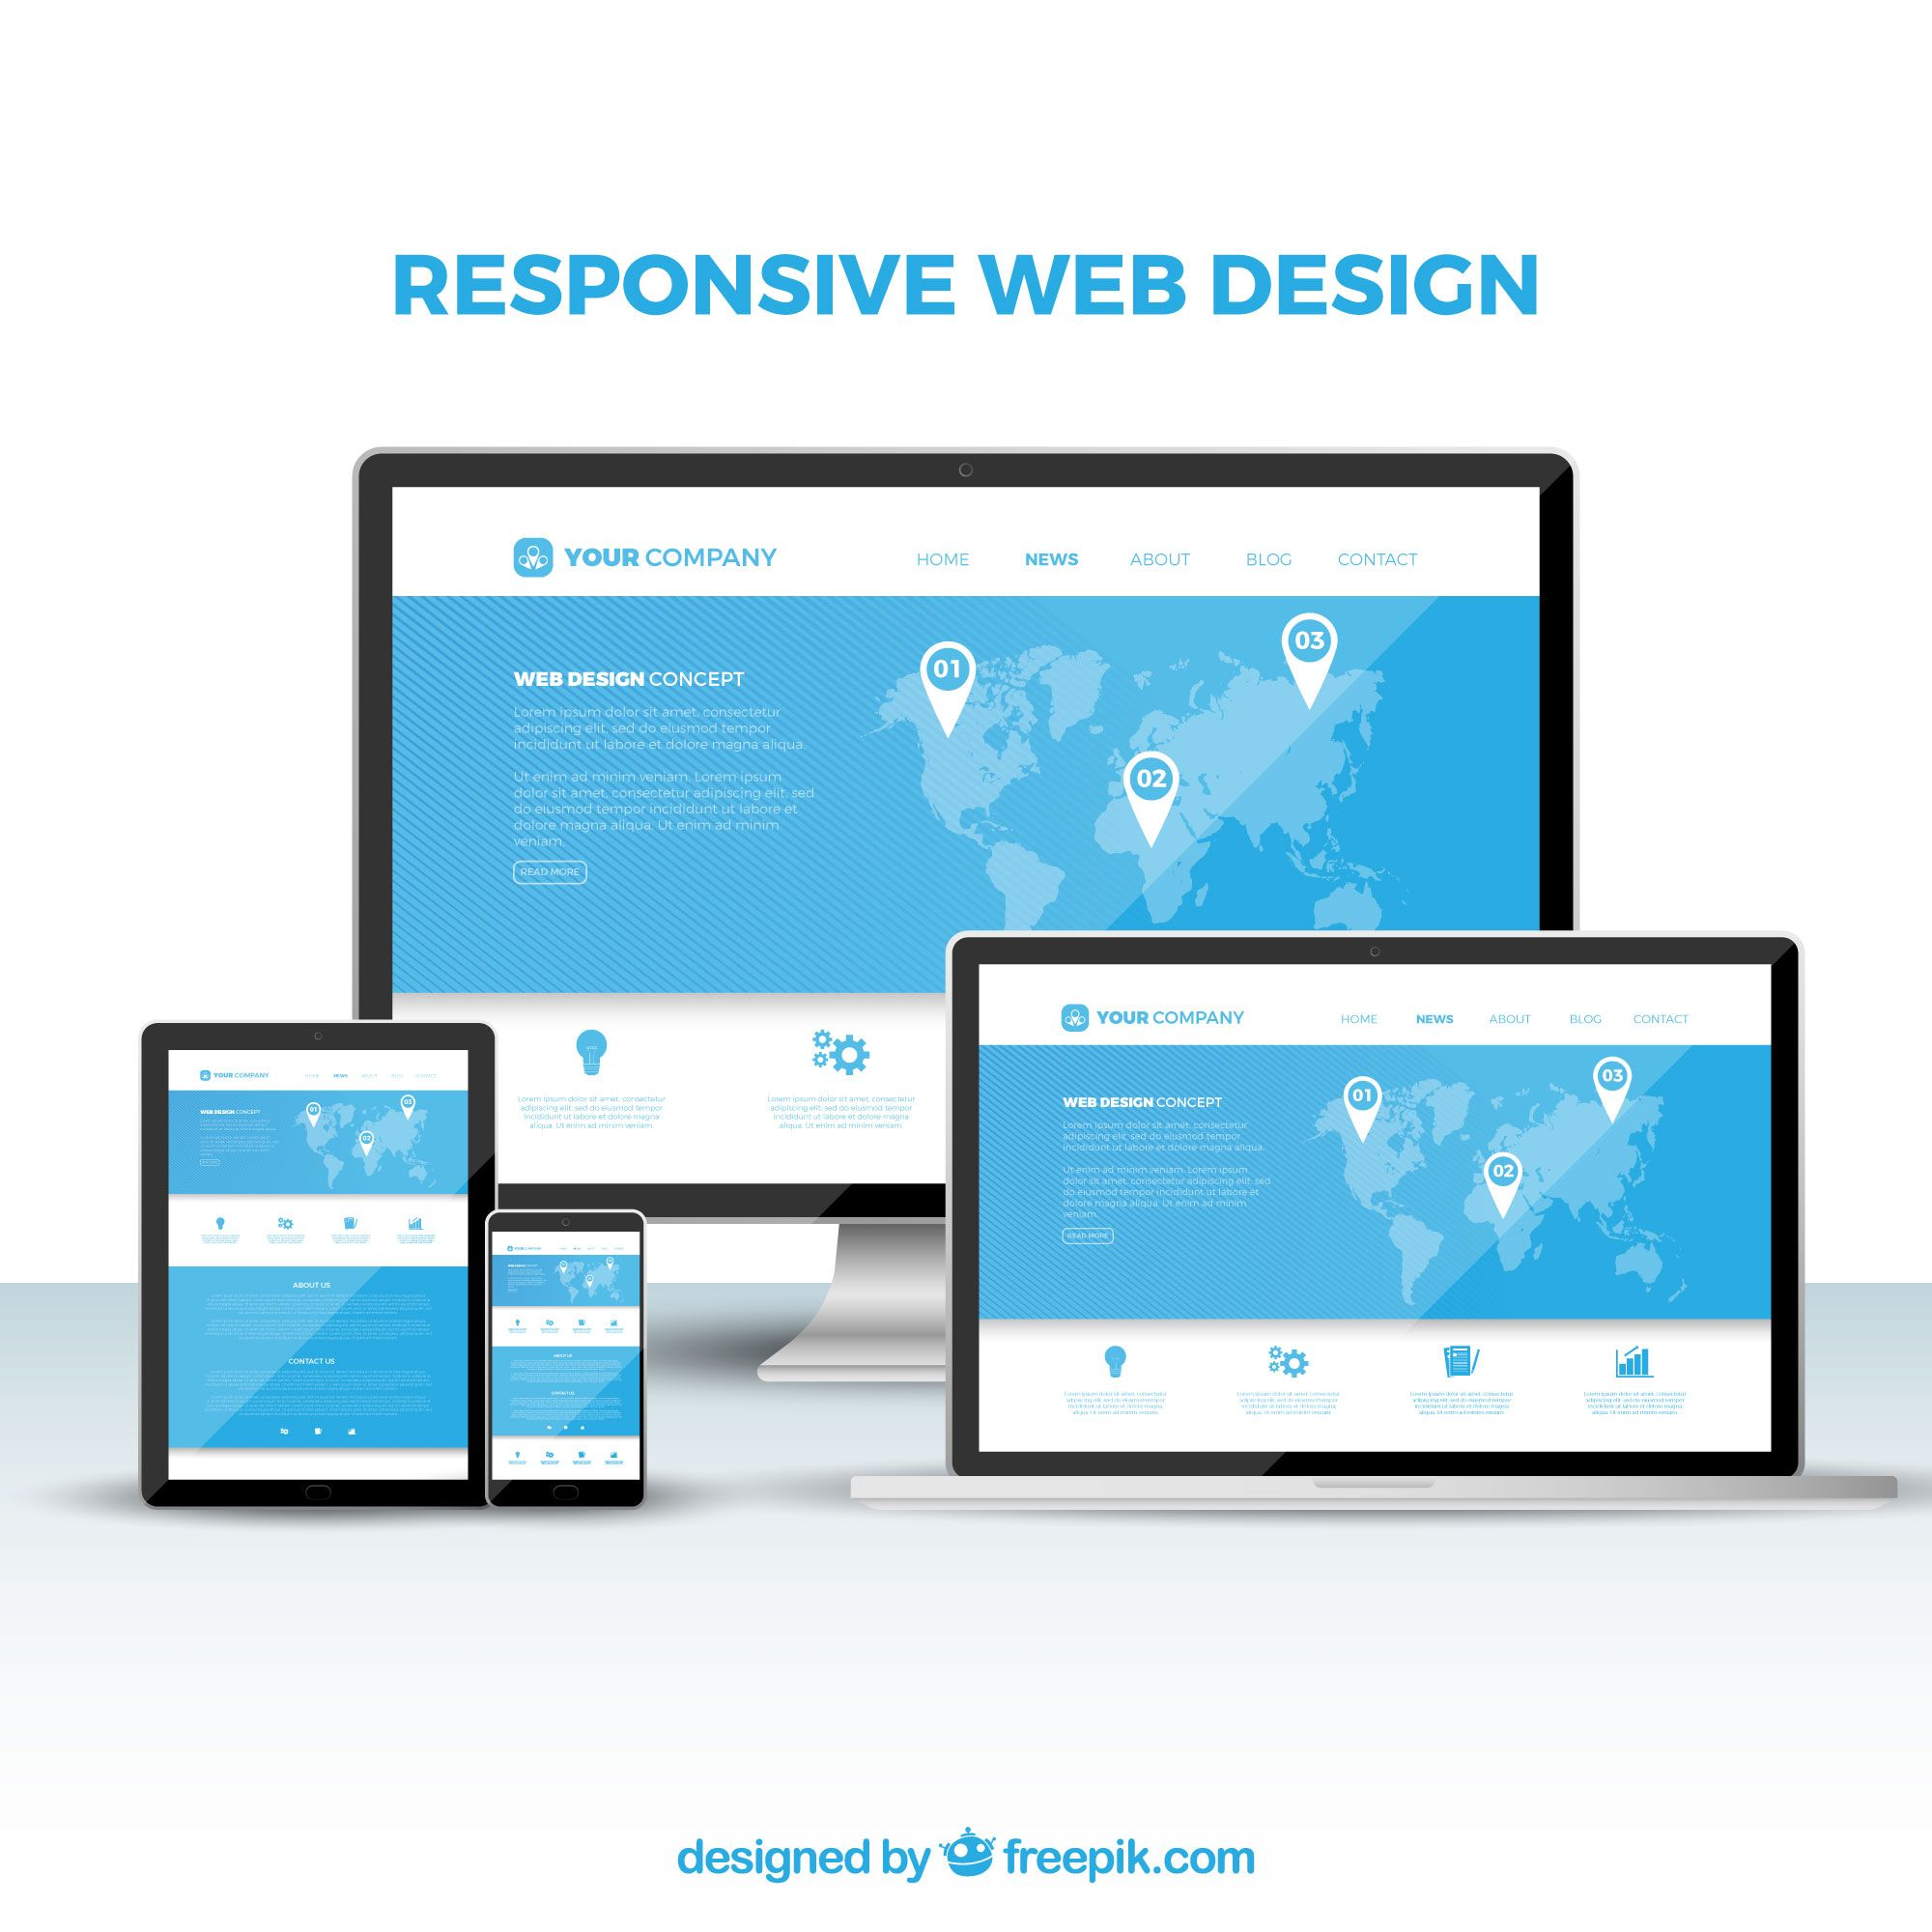 Website Is The Easiest Way To Make Brillionaire Today World Digitalmarketing Seo Websitedesi With Images Web Design Responsive Website Design Website Design Company